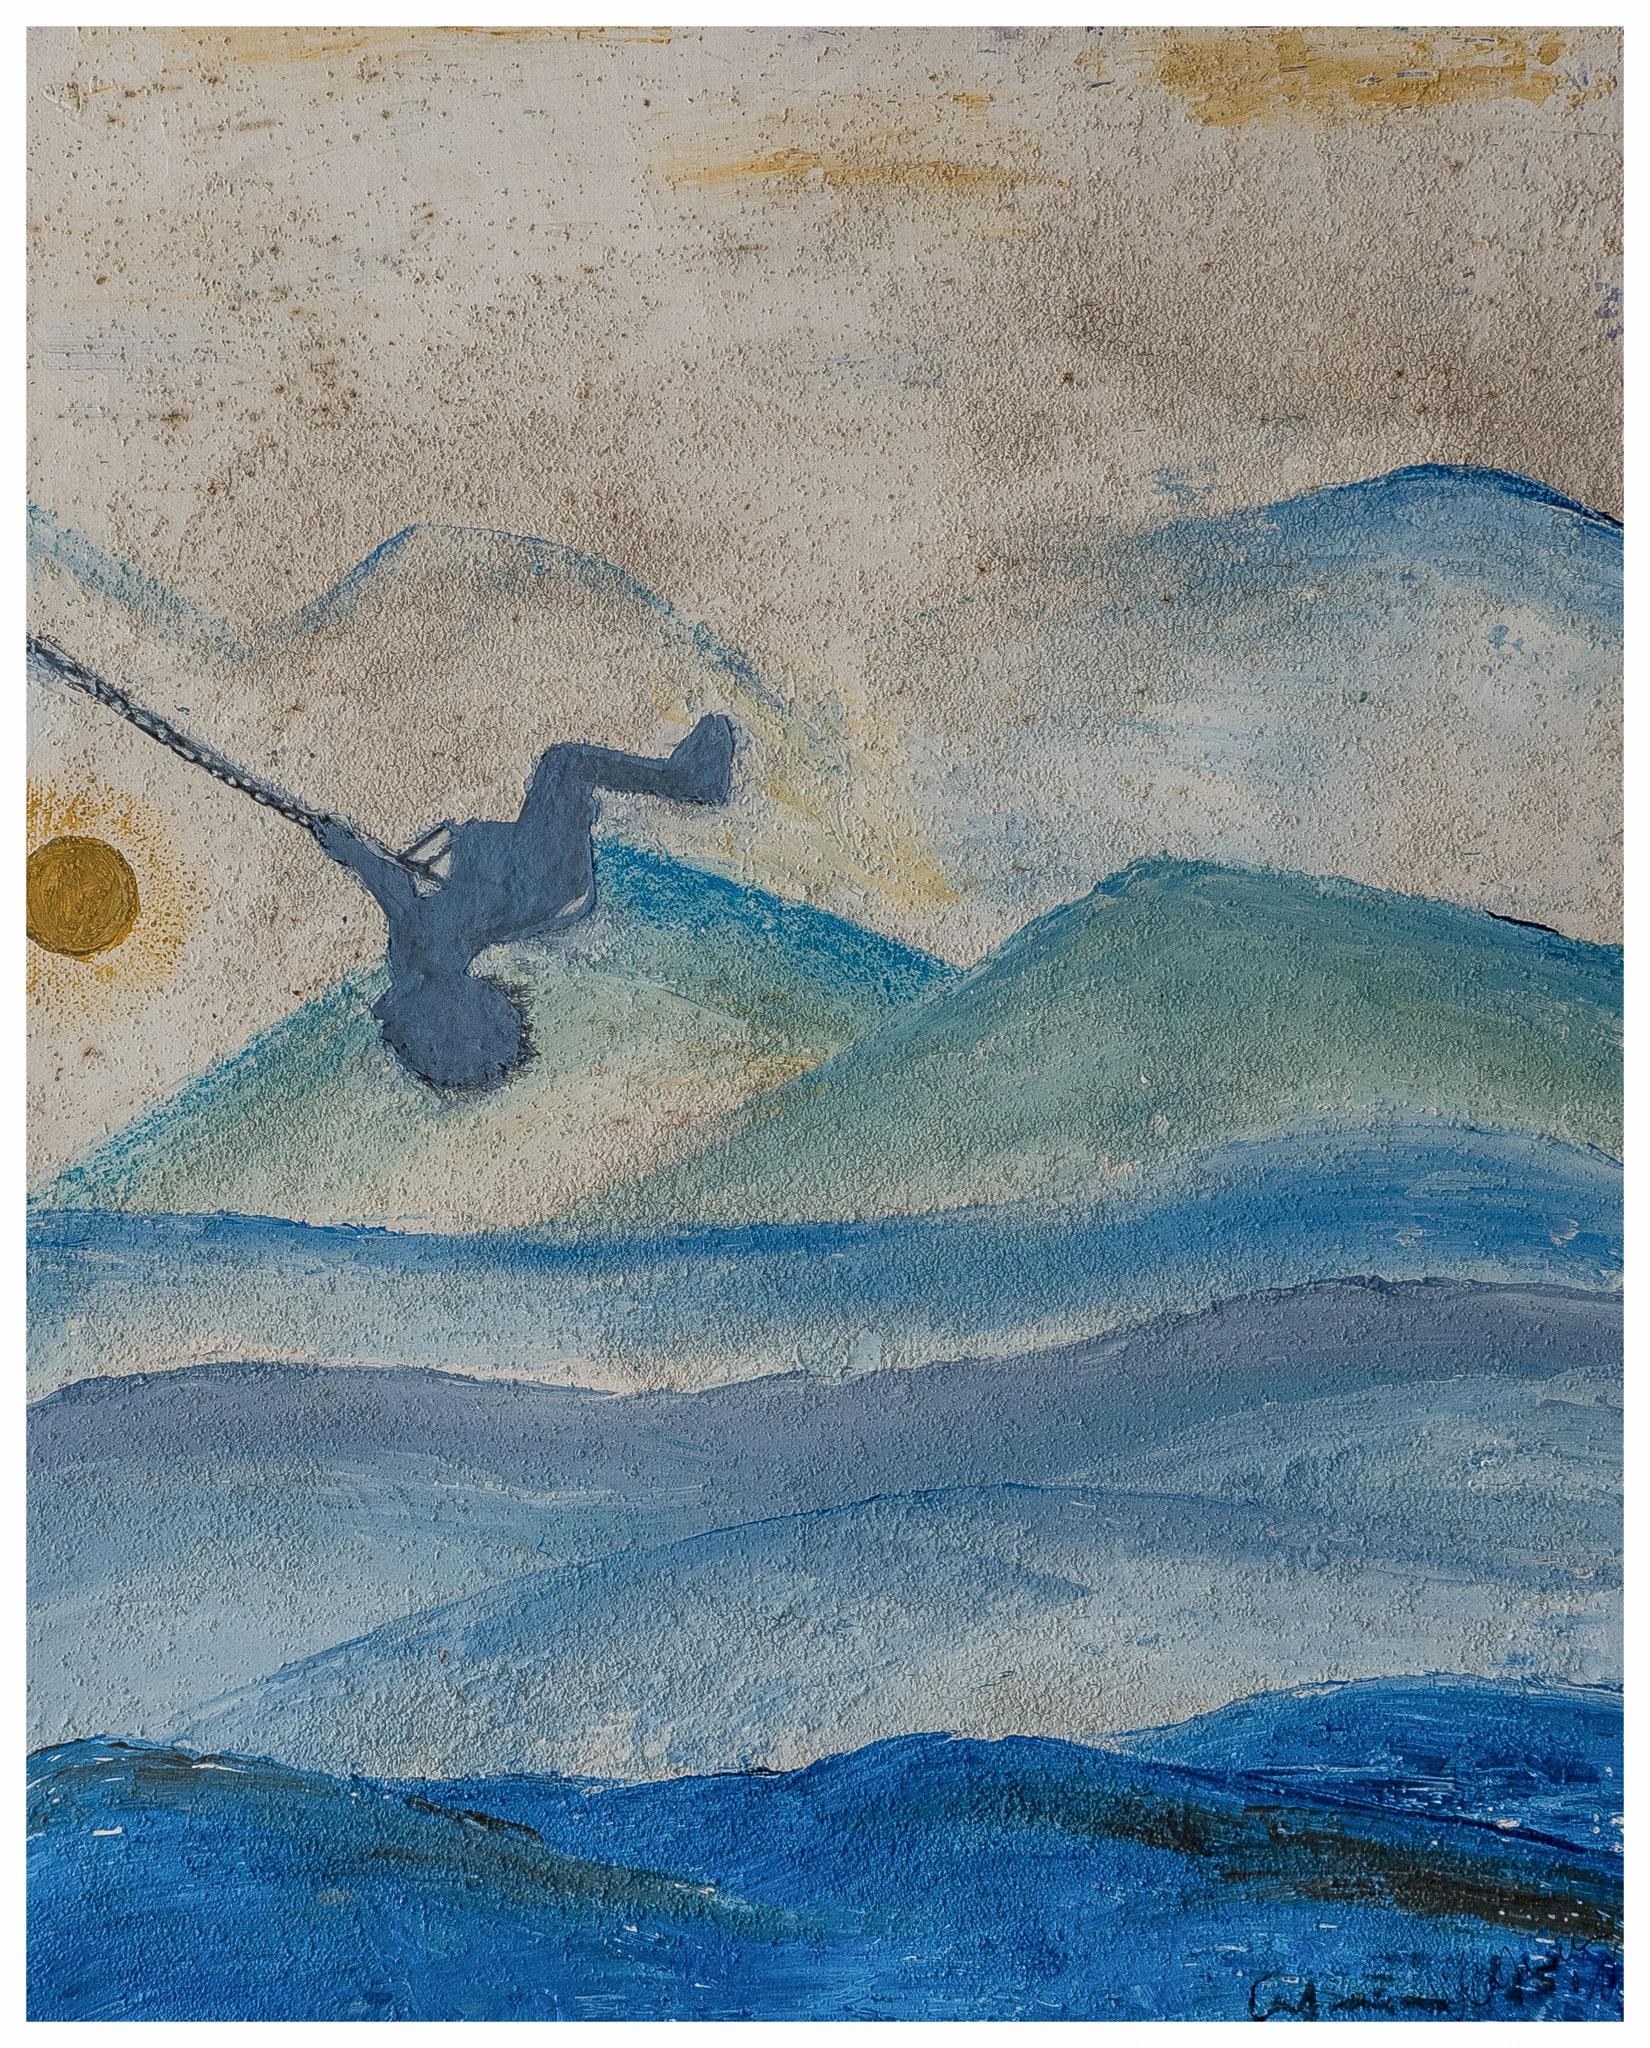 Schwerelos - Acryl, Sand - 30 x 40 cm